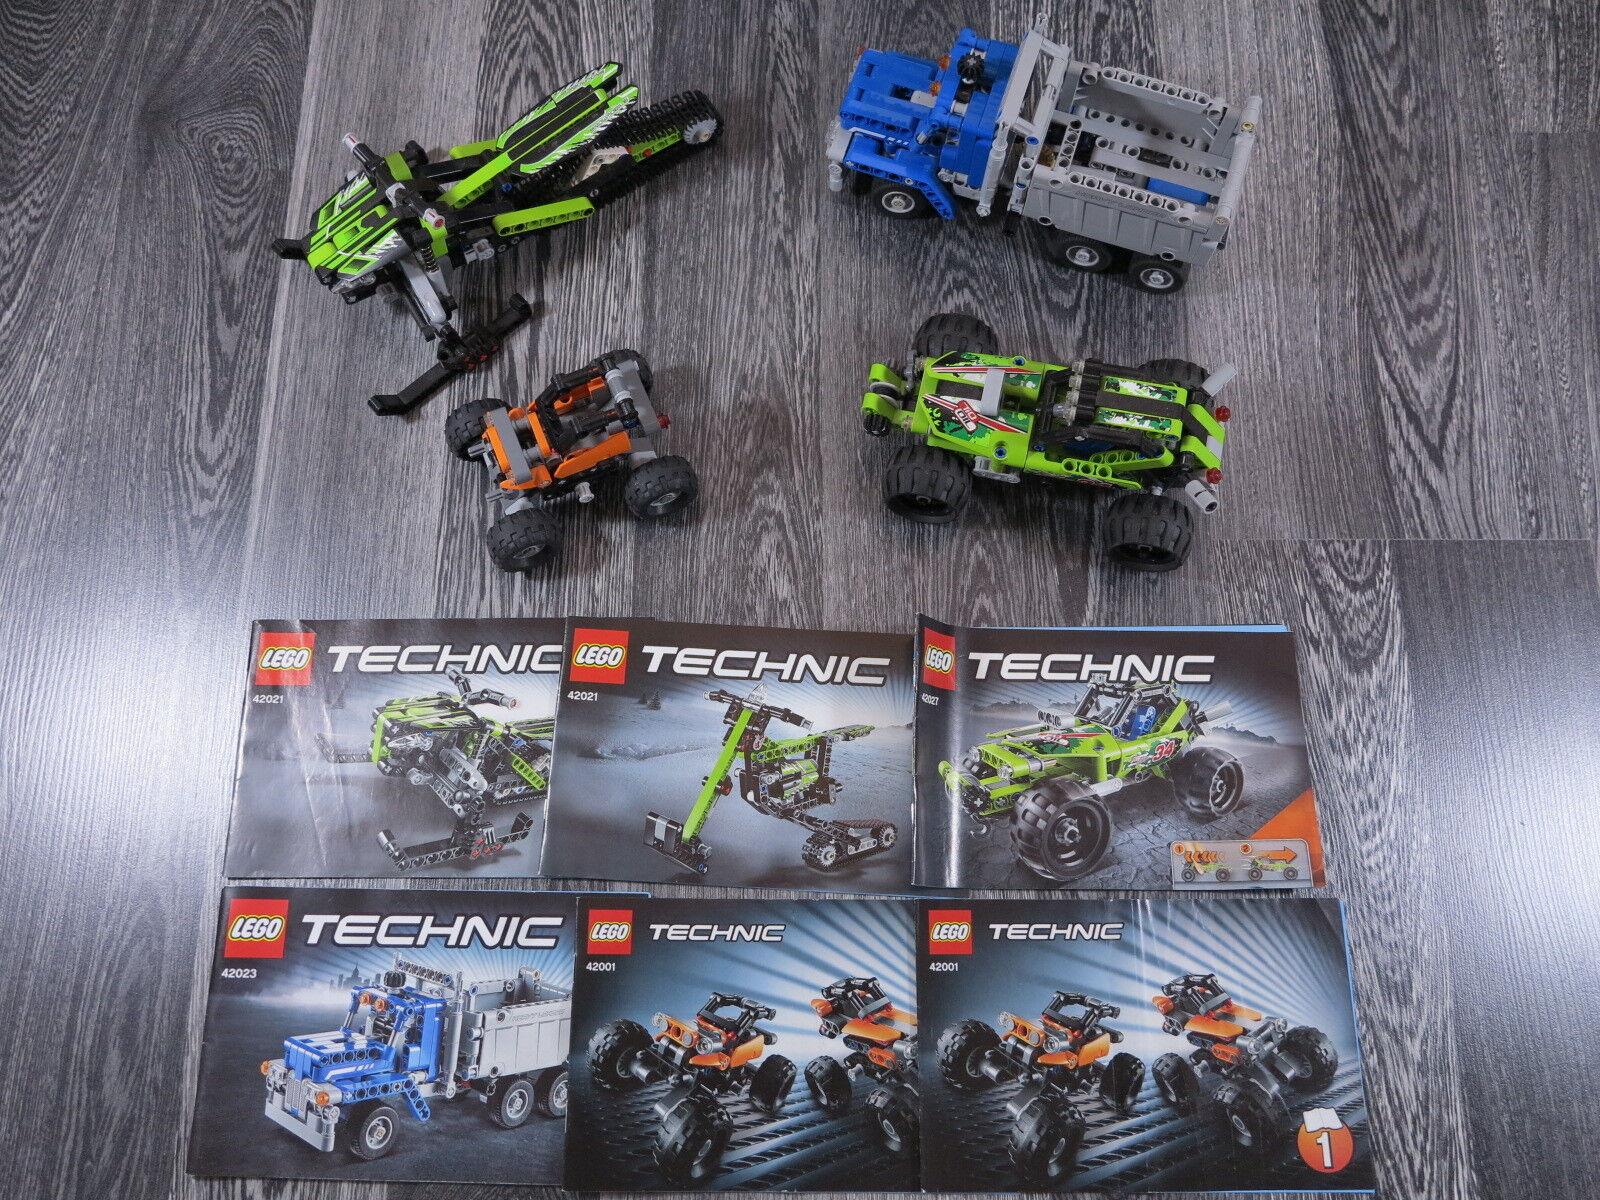 LEGO TECHNIK 42001,42021,42023,42027 Auto Raupe Bagger Schneeraupe, LKW Laster